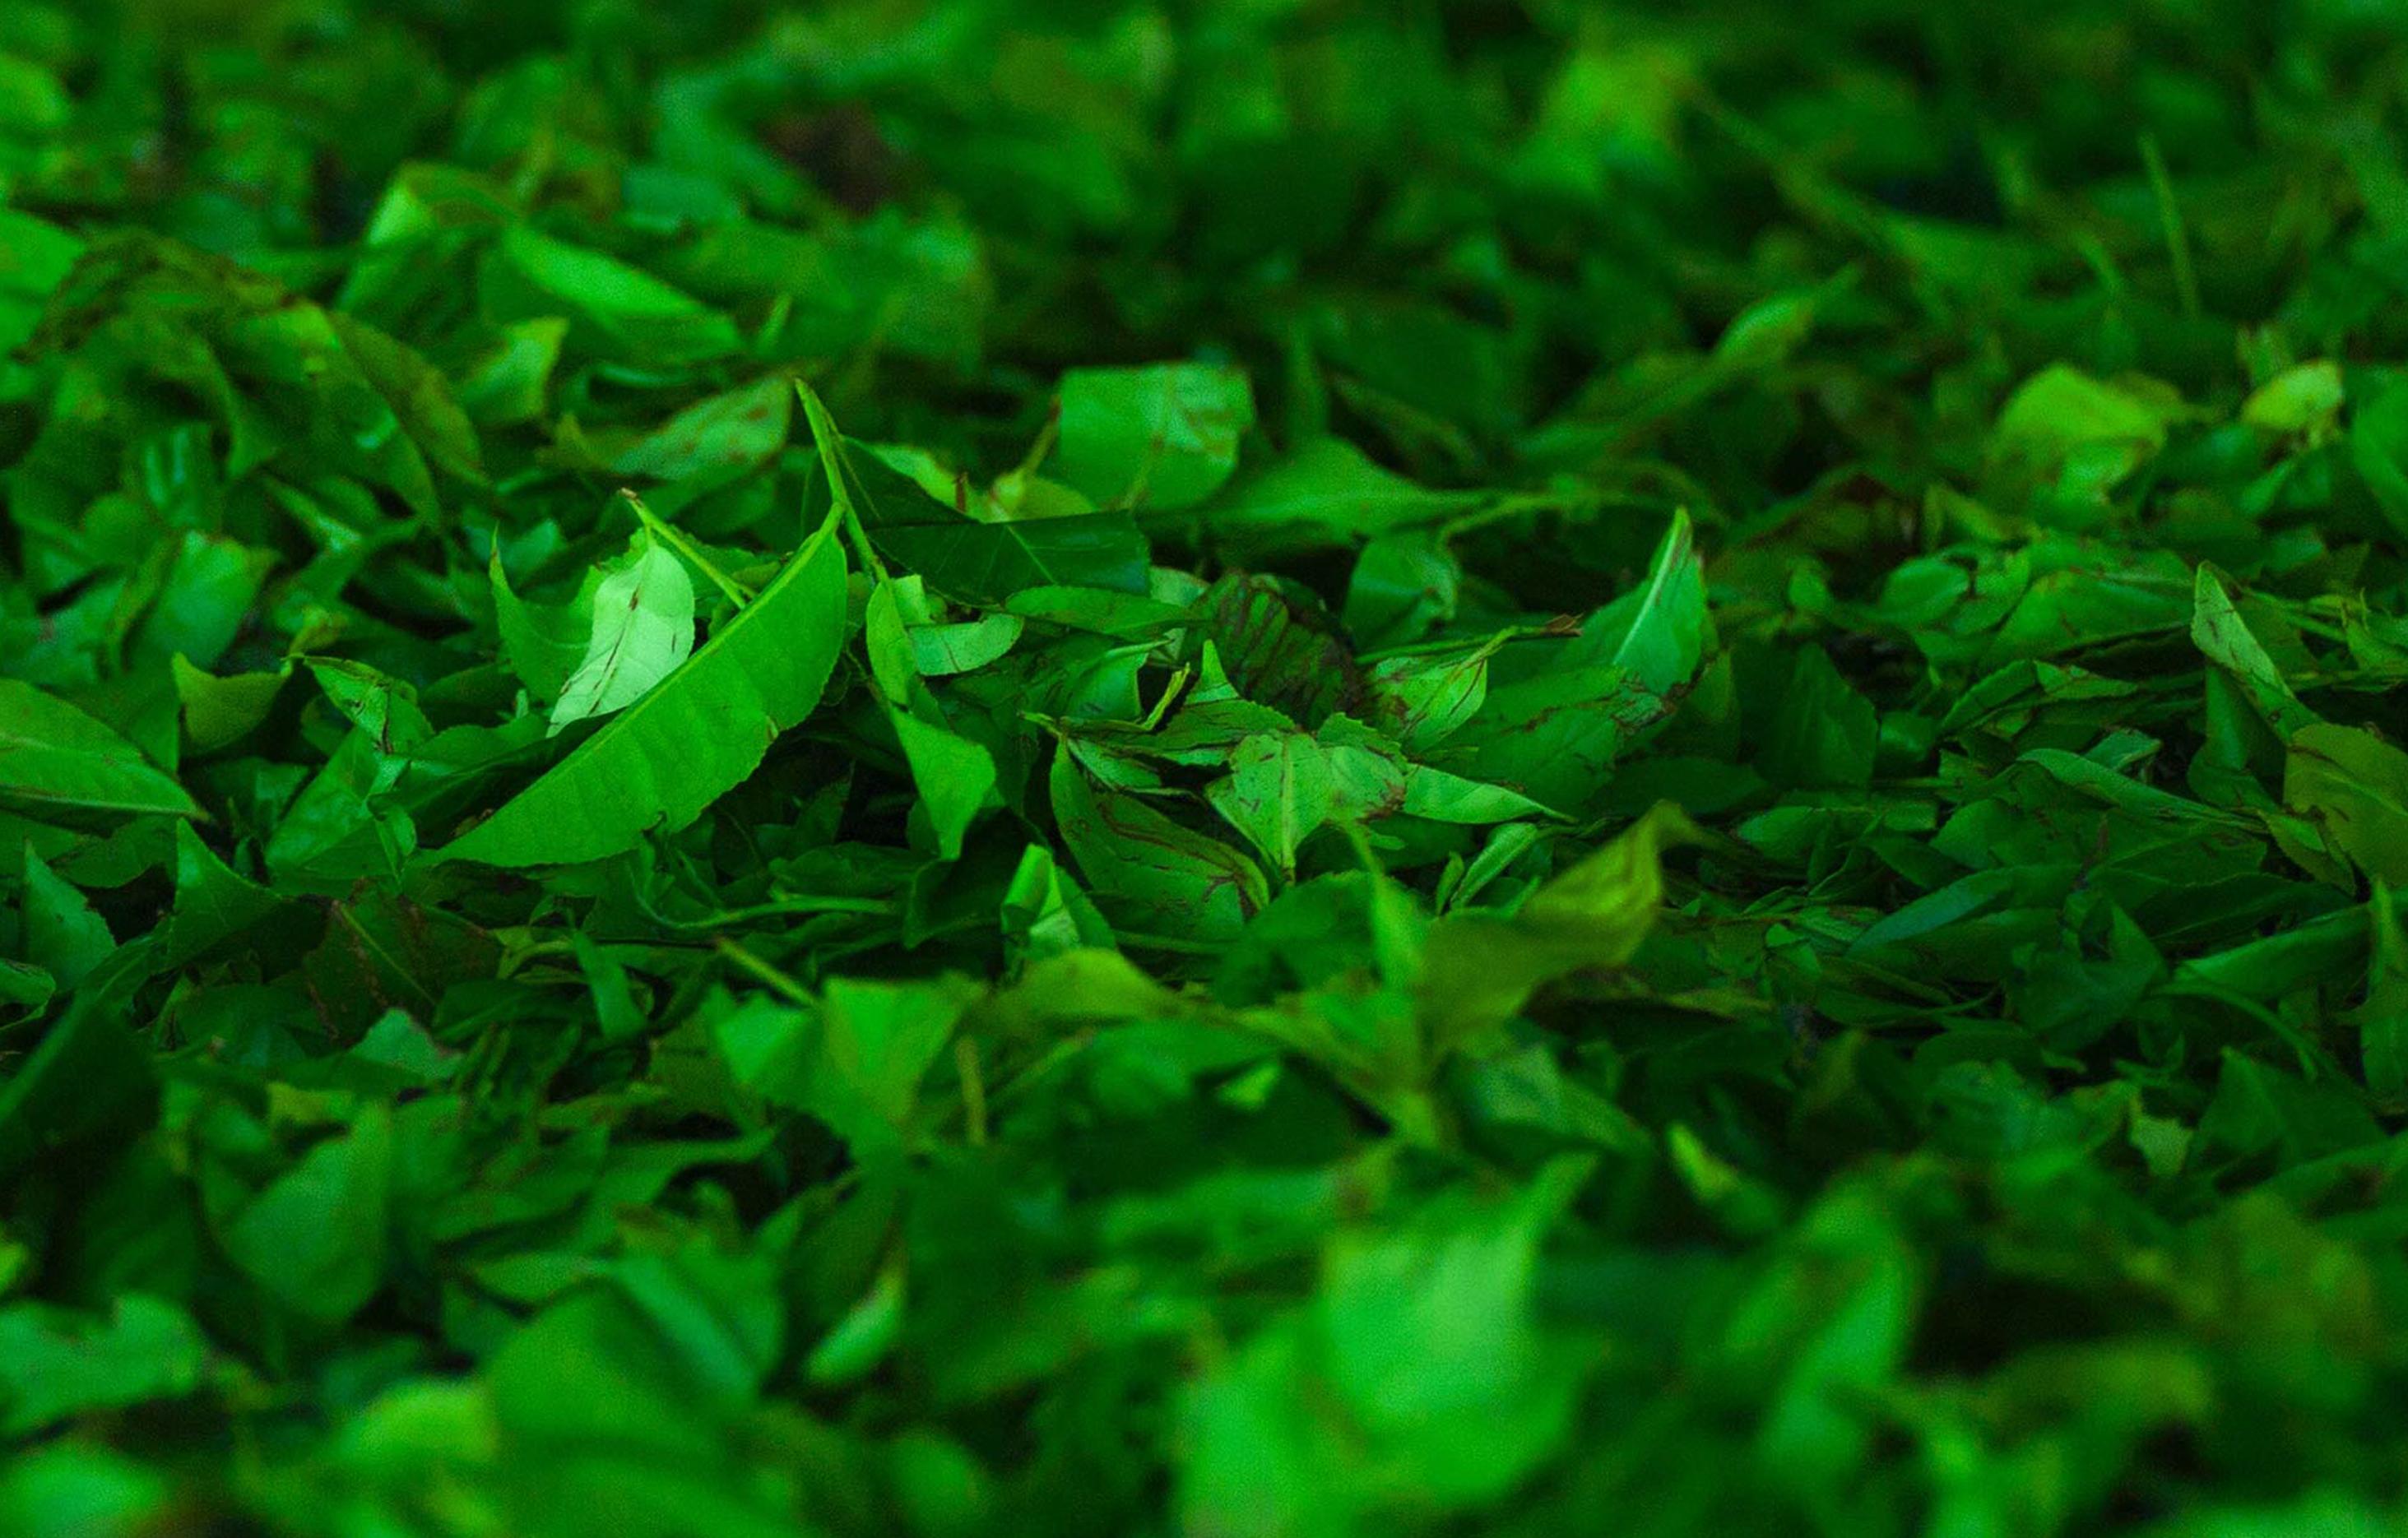 Green Tea Leaves All-Nutrient